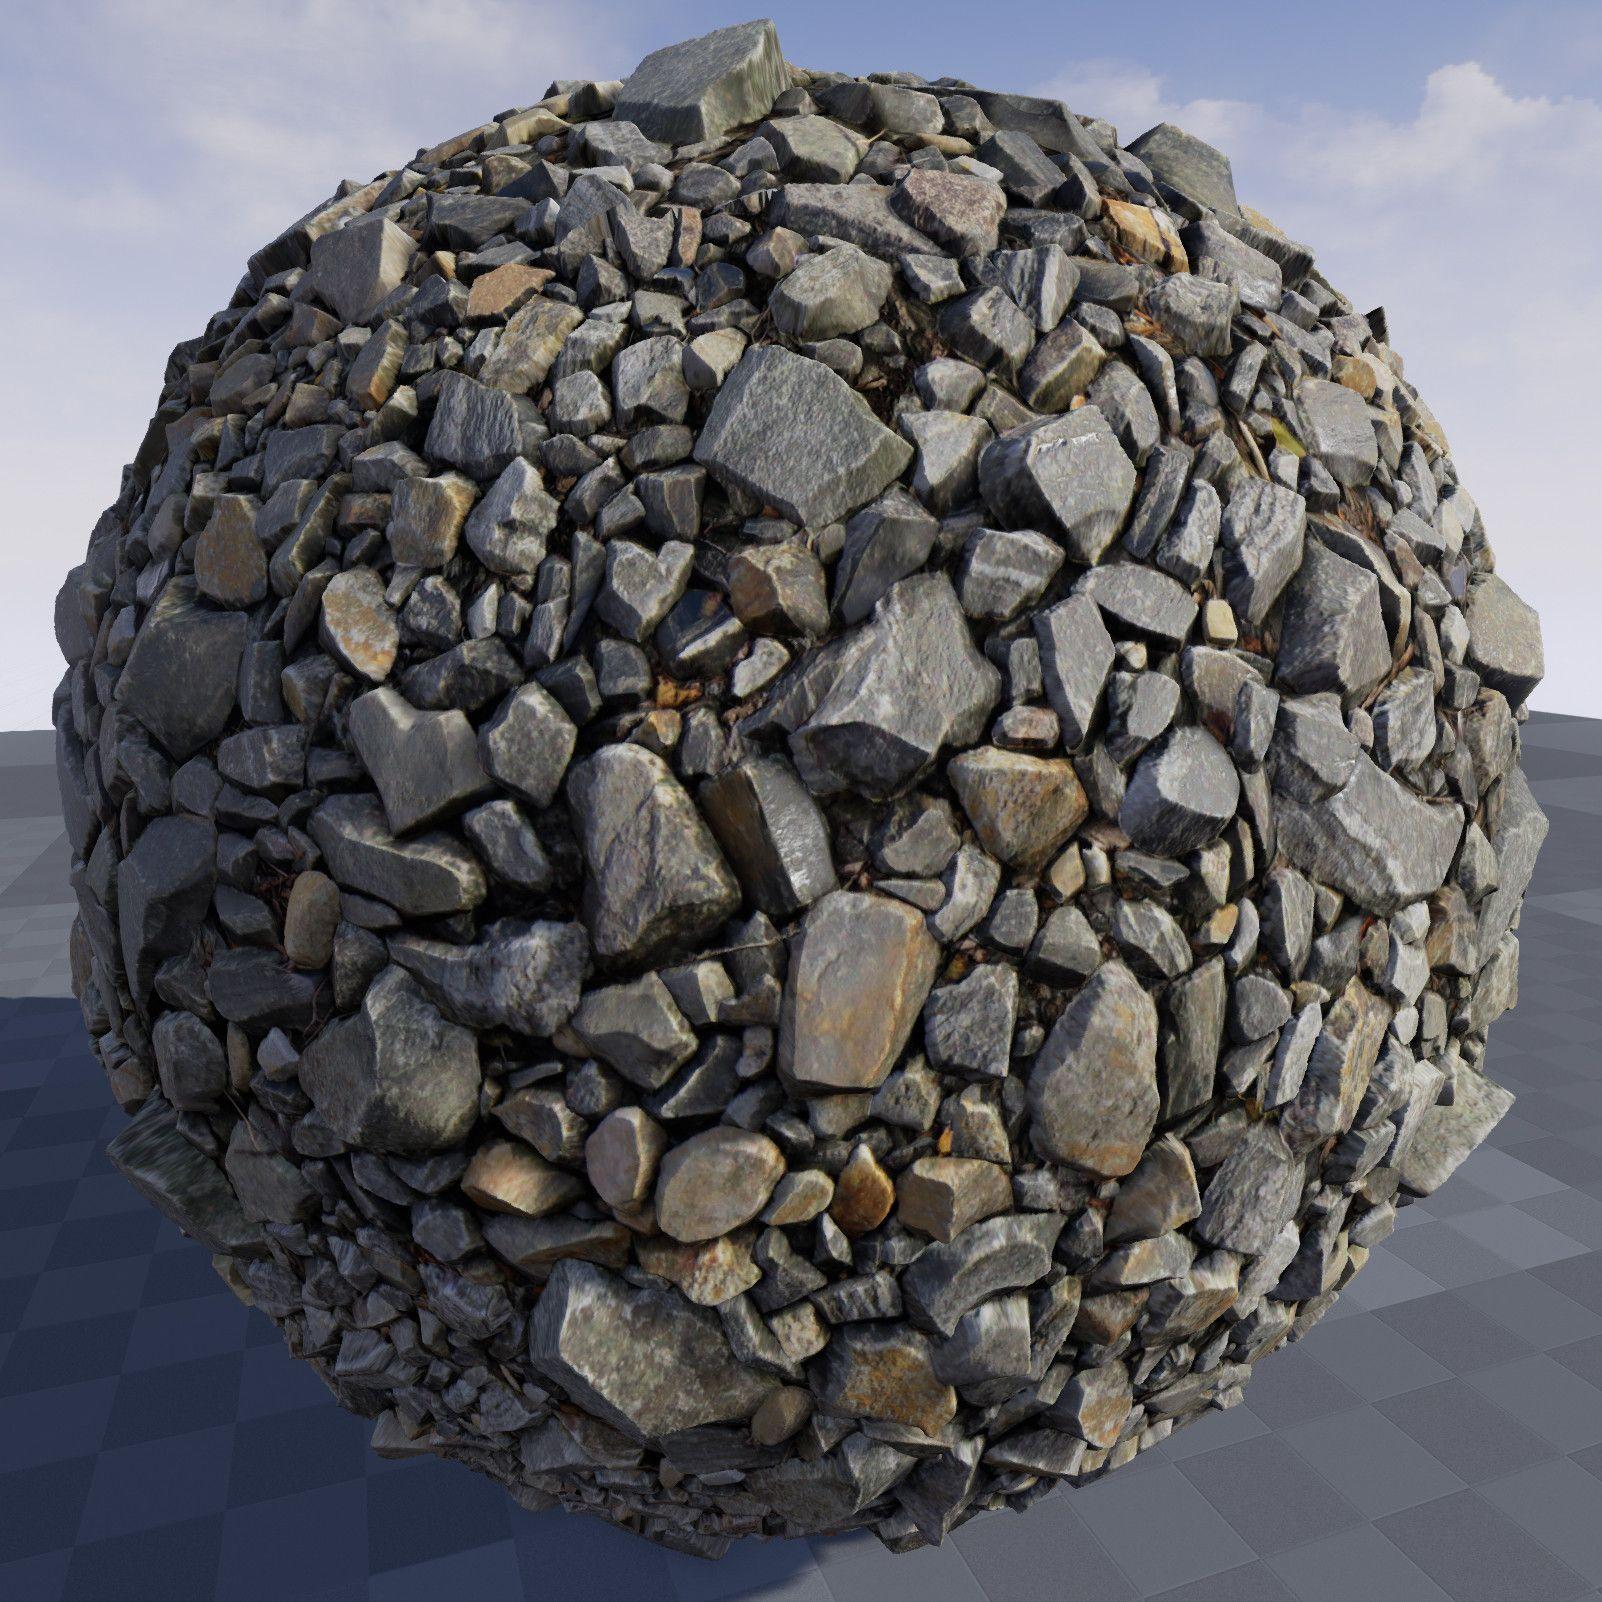 ArtStation - Texture of stone debris in Unreal Engine 4 9, Crazy